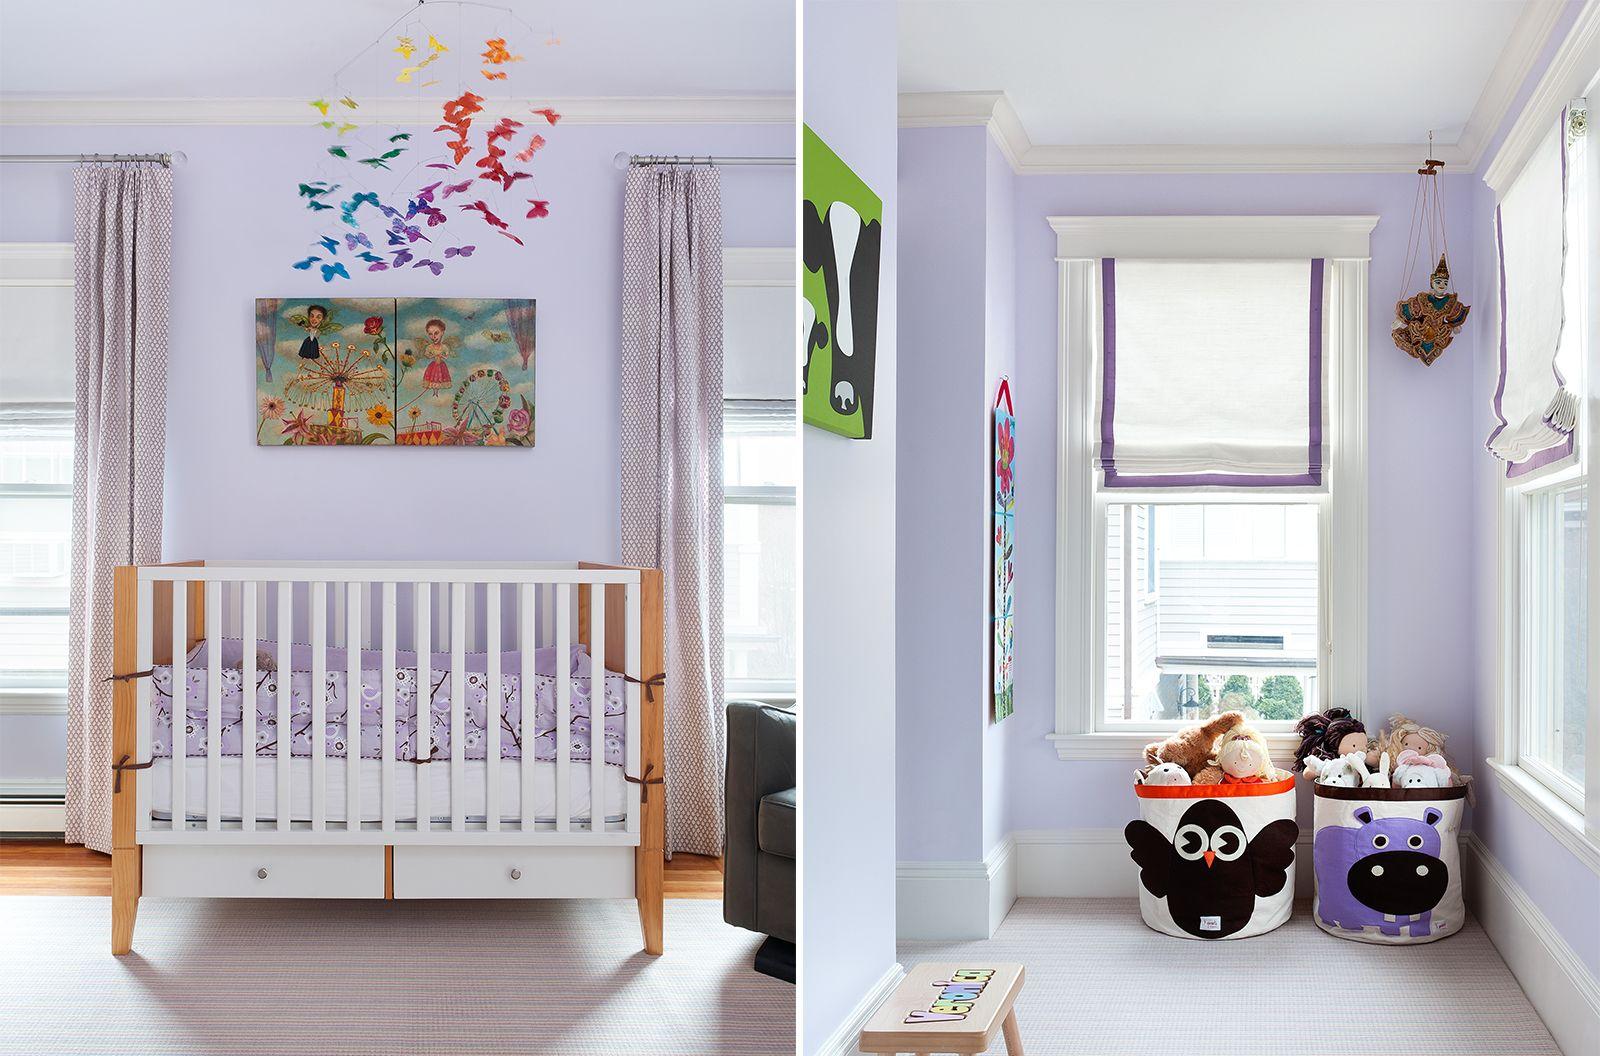 mandarina studio  boston  nursery  interior design  - mandarina studio  boston  nursery  interior design  contemporary  babyroom  colorful